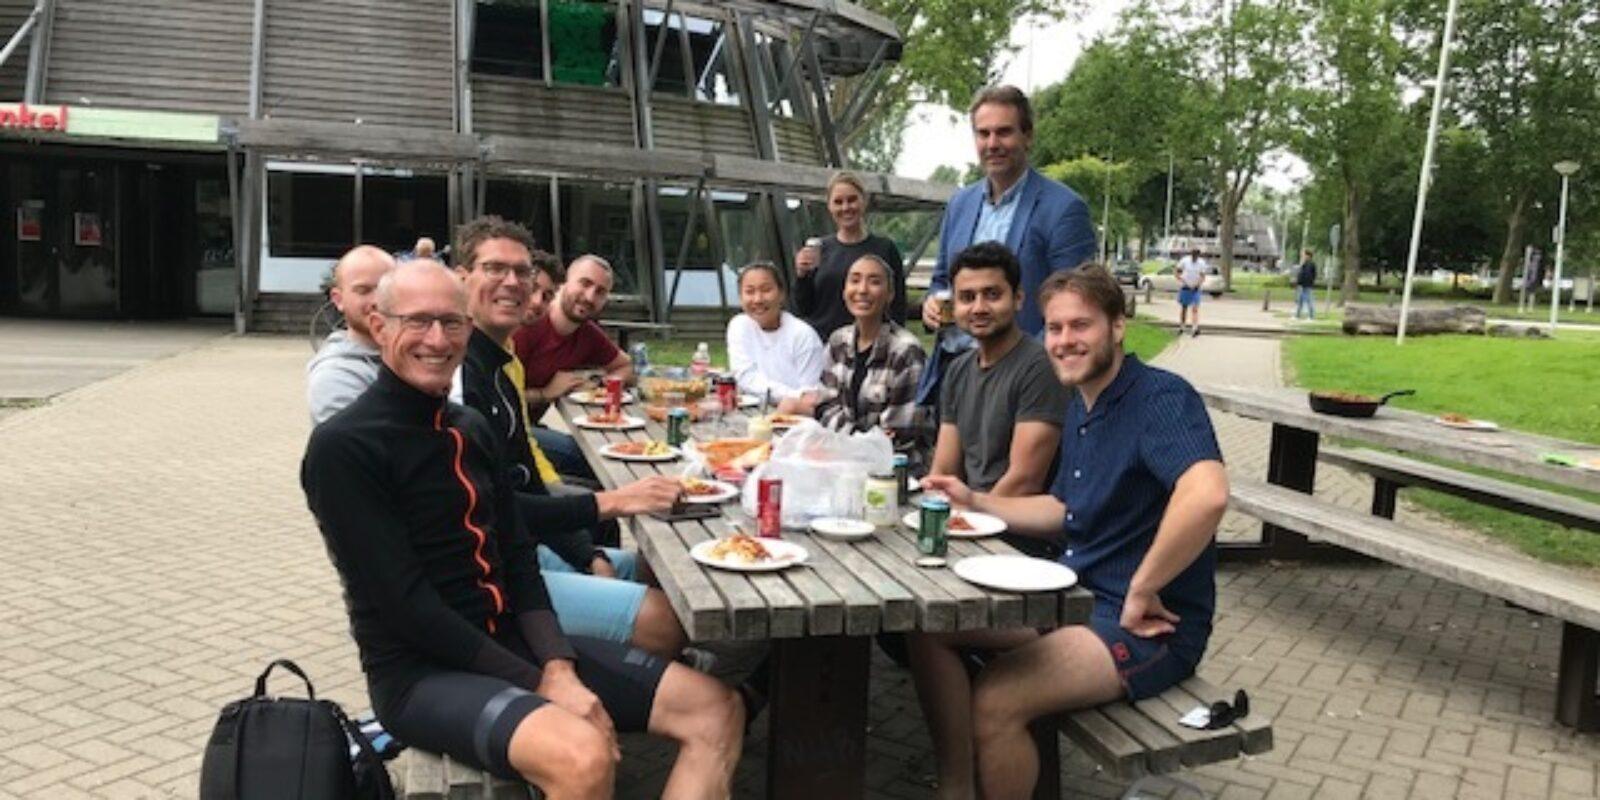 Fitsurance Team Event in Amsterdam: 'supper vet'